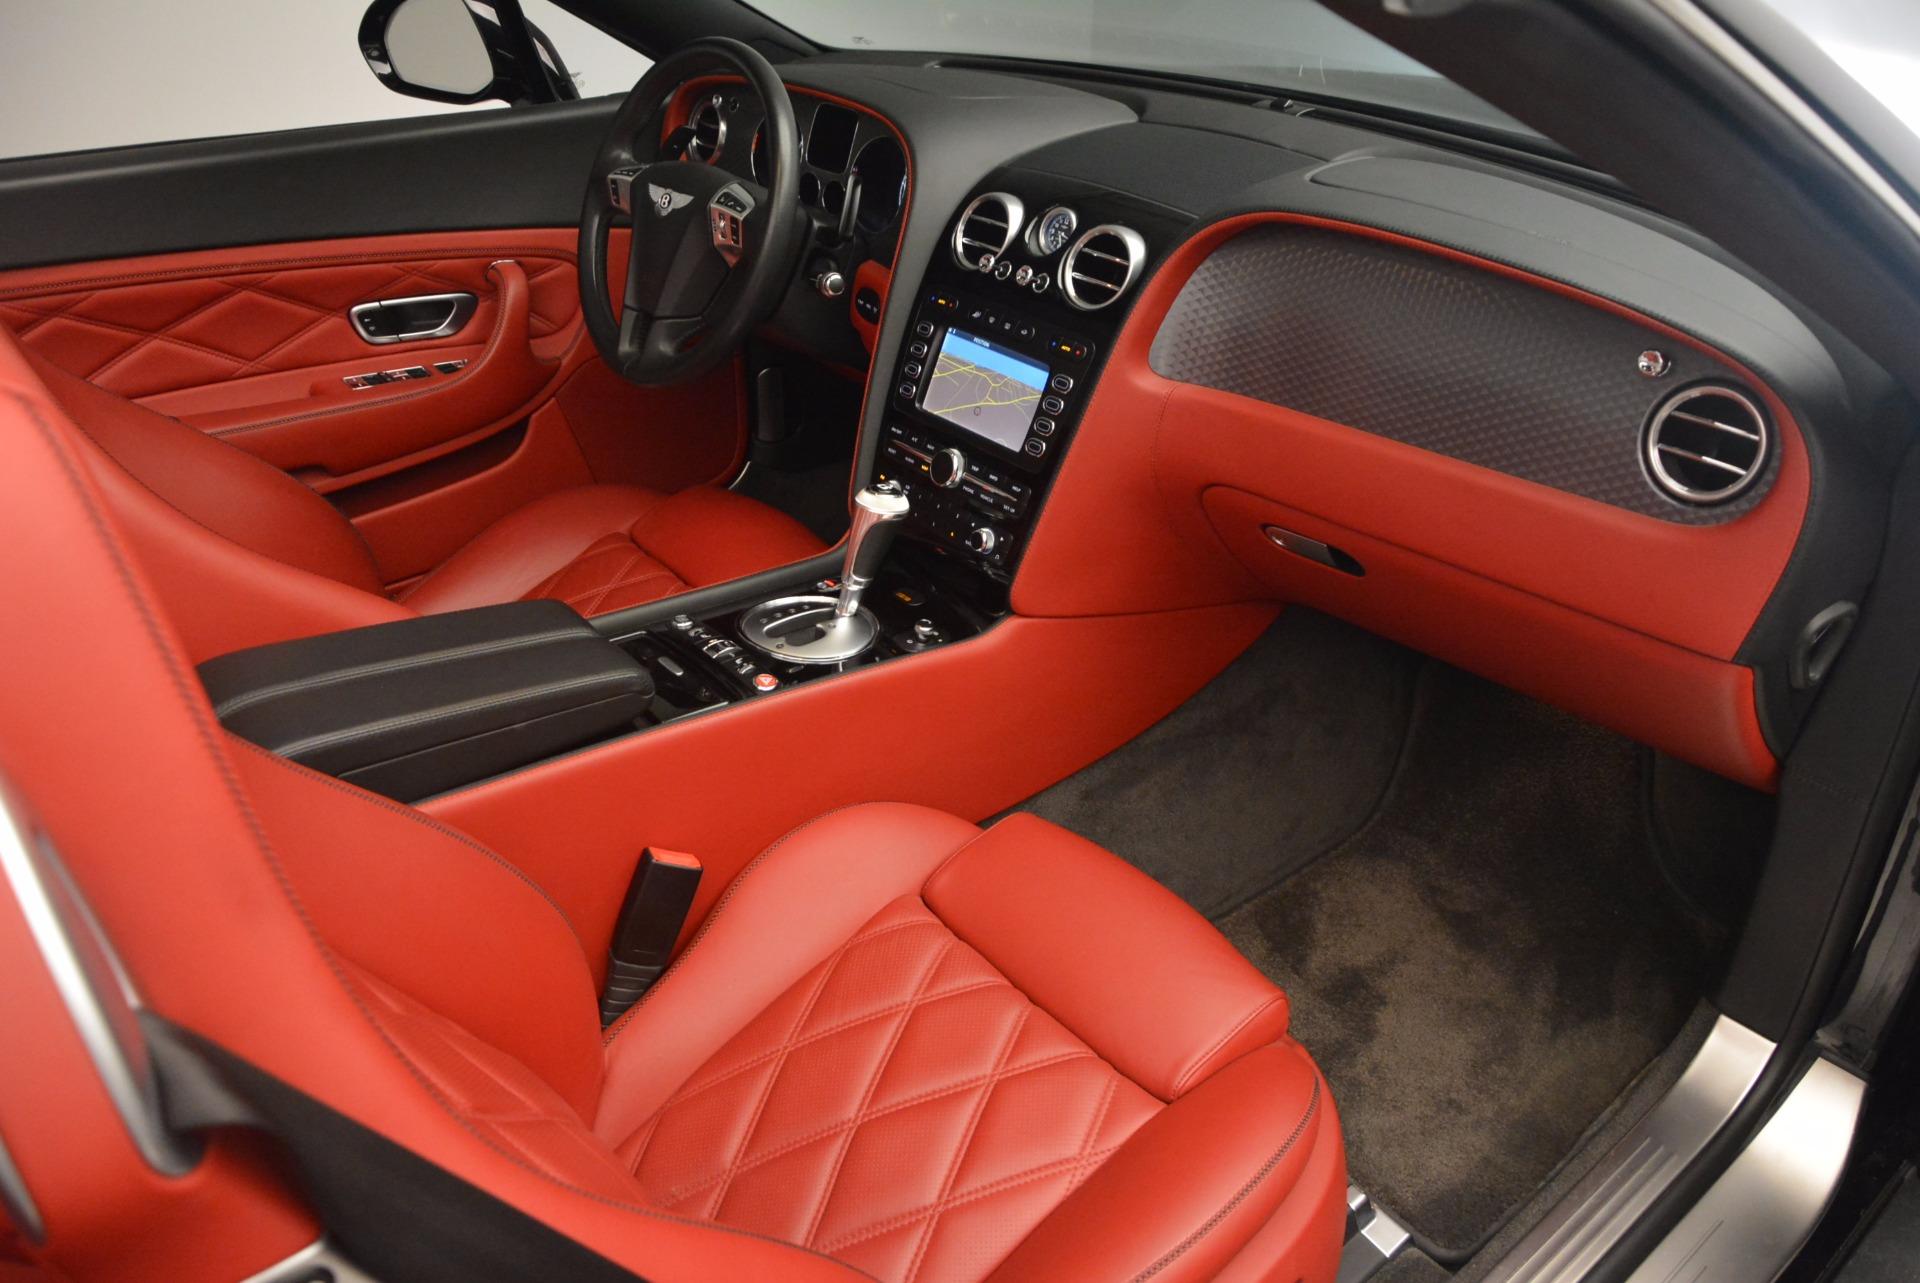 Used 2010 Bentley Continental GT Speed For Sale In Westport, CT 1298_p43